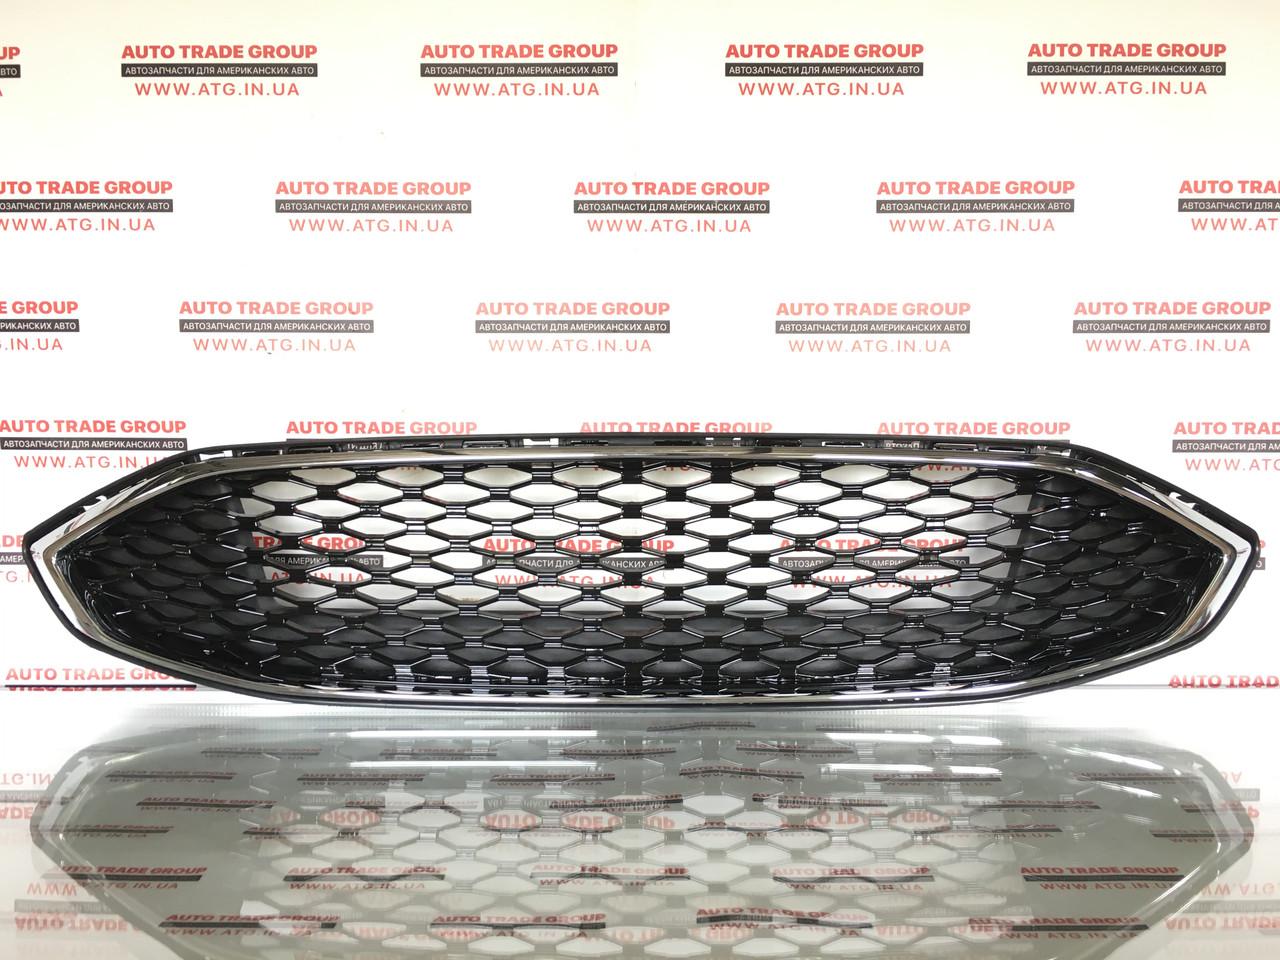 Решетка бампера верхняя черная хром ободок Ford Fusion 2017-2018 неоригинал HS7Z8200VA